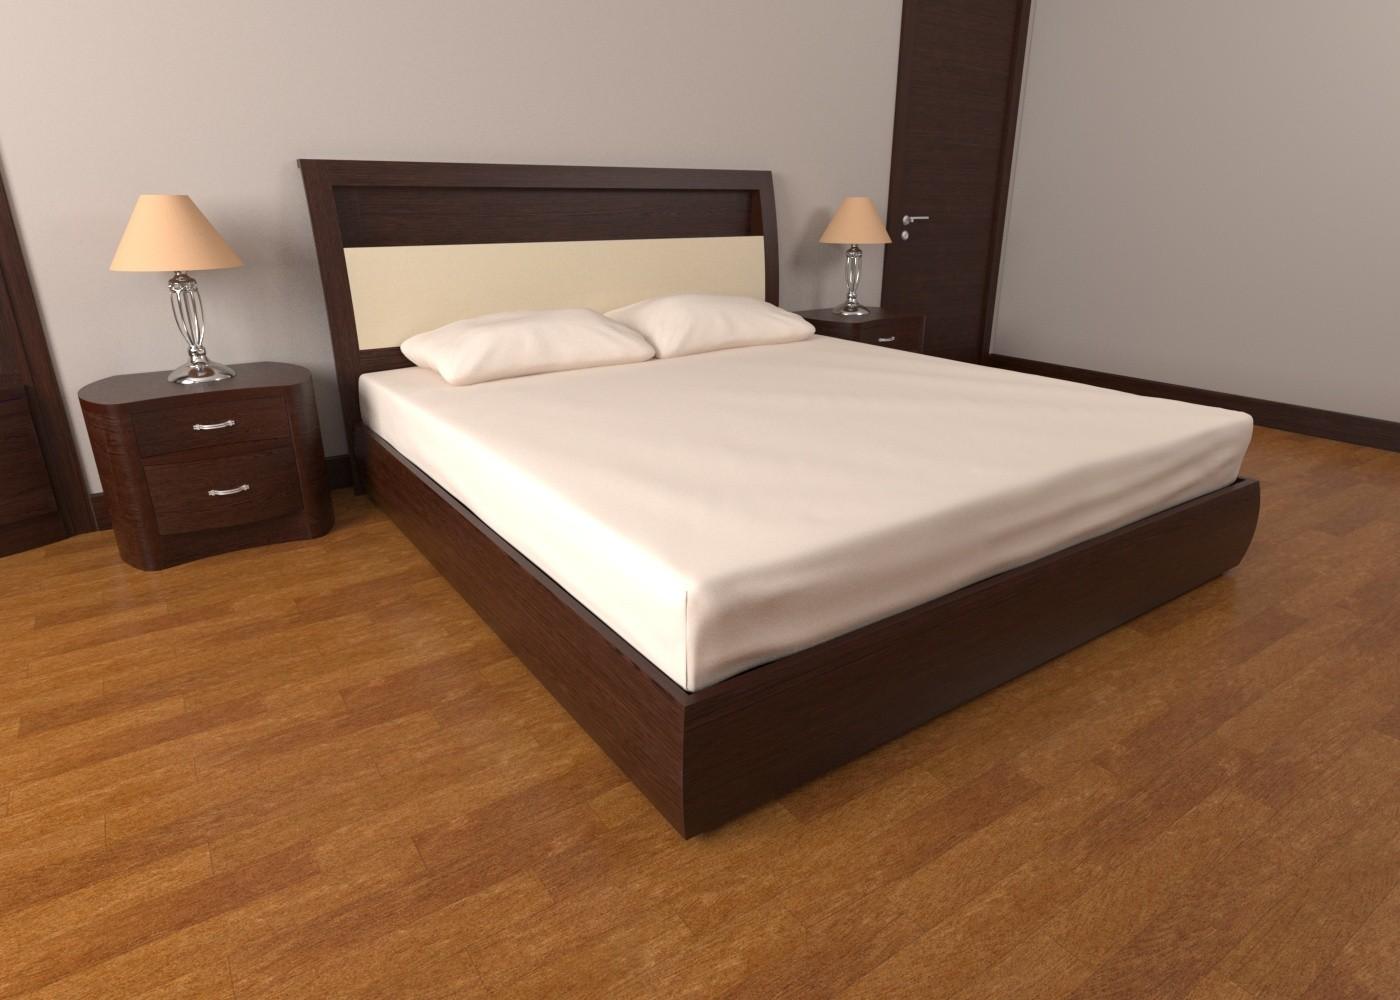 modern bedroom-01.jpg